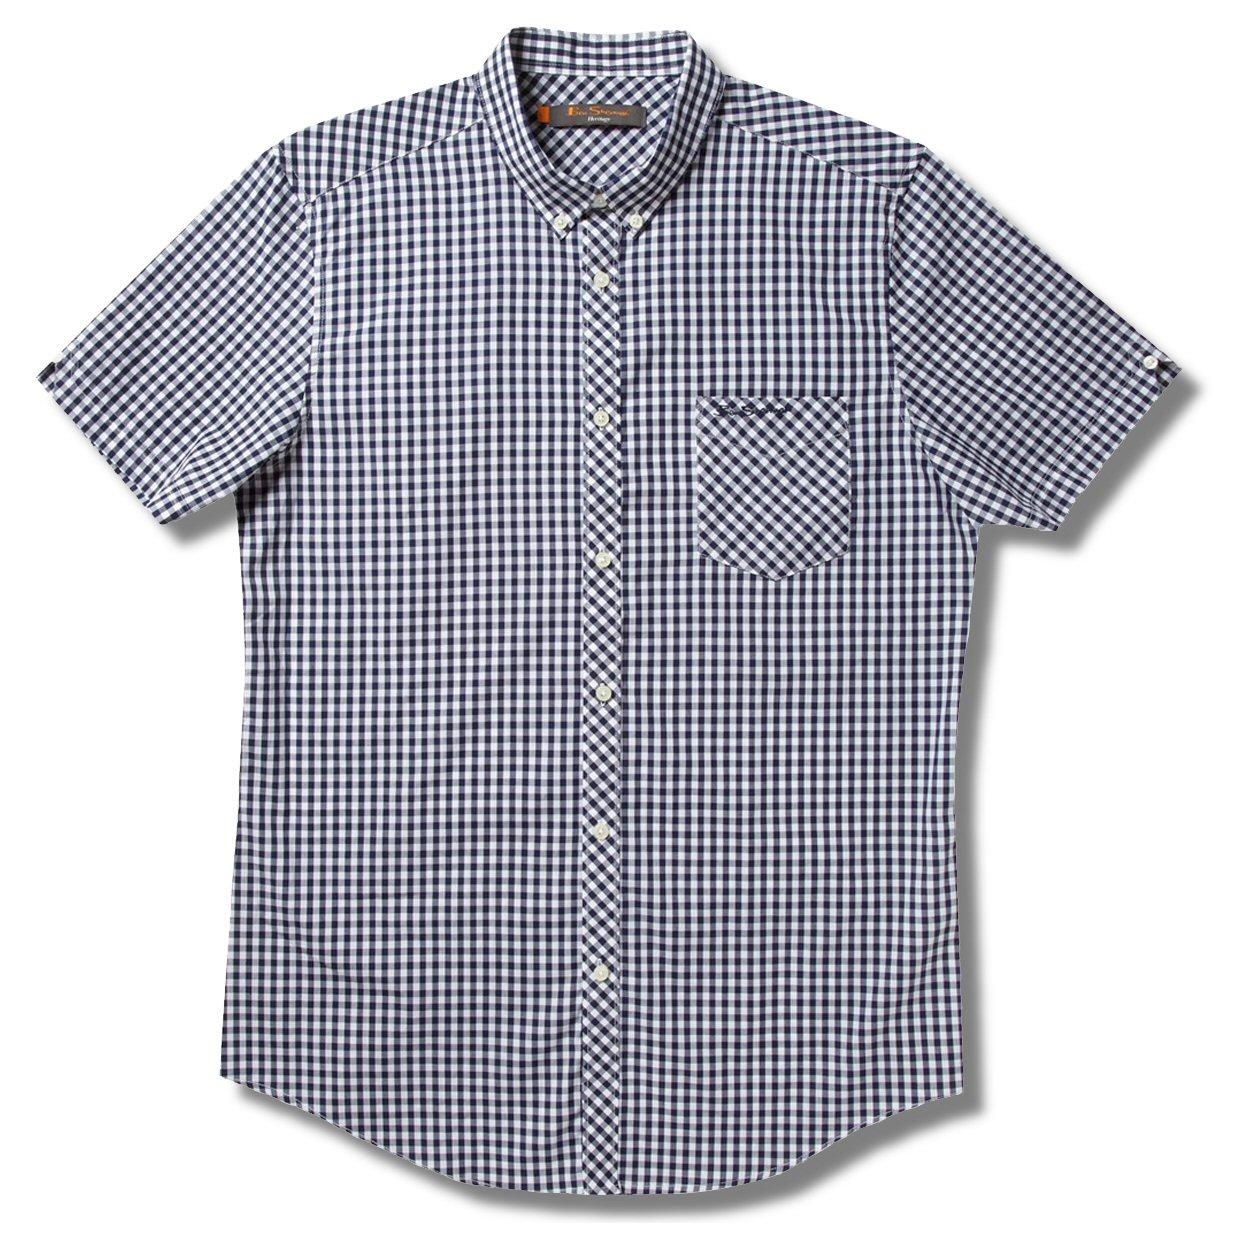 Ben Sherman Mod Skin Gingham Check Short Sleeve Shirt Navy